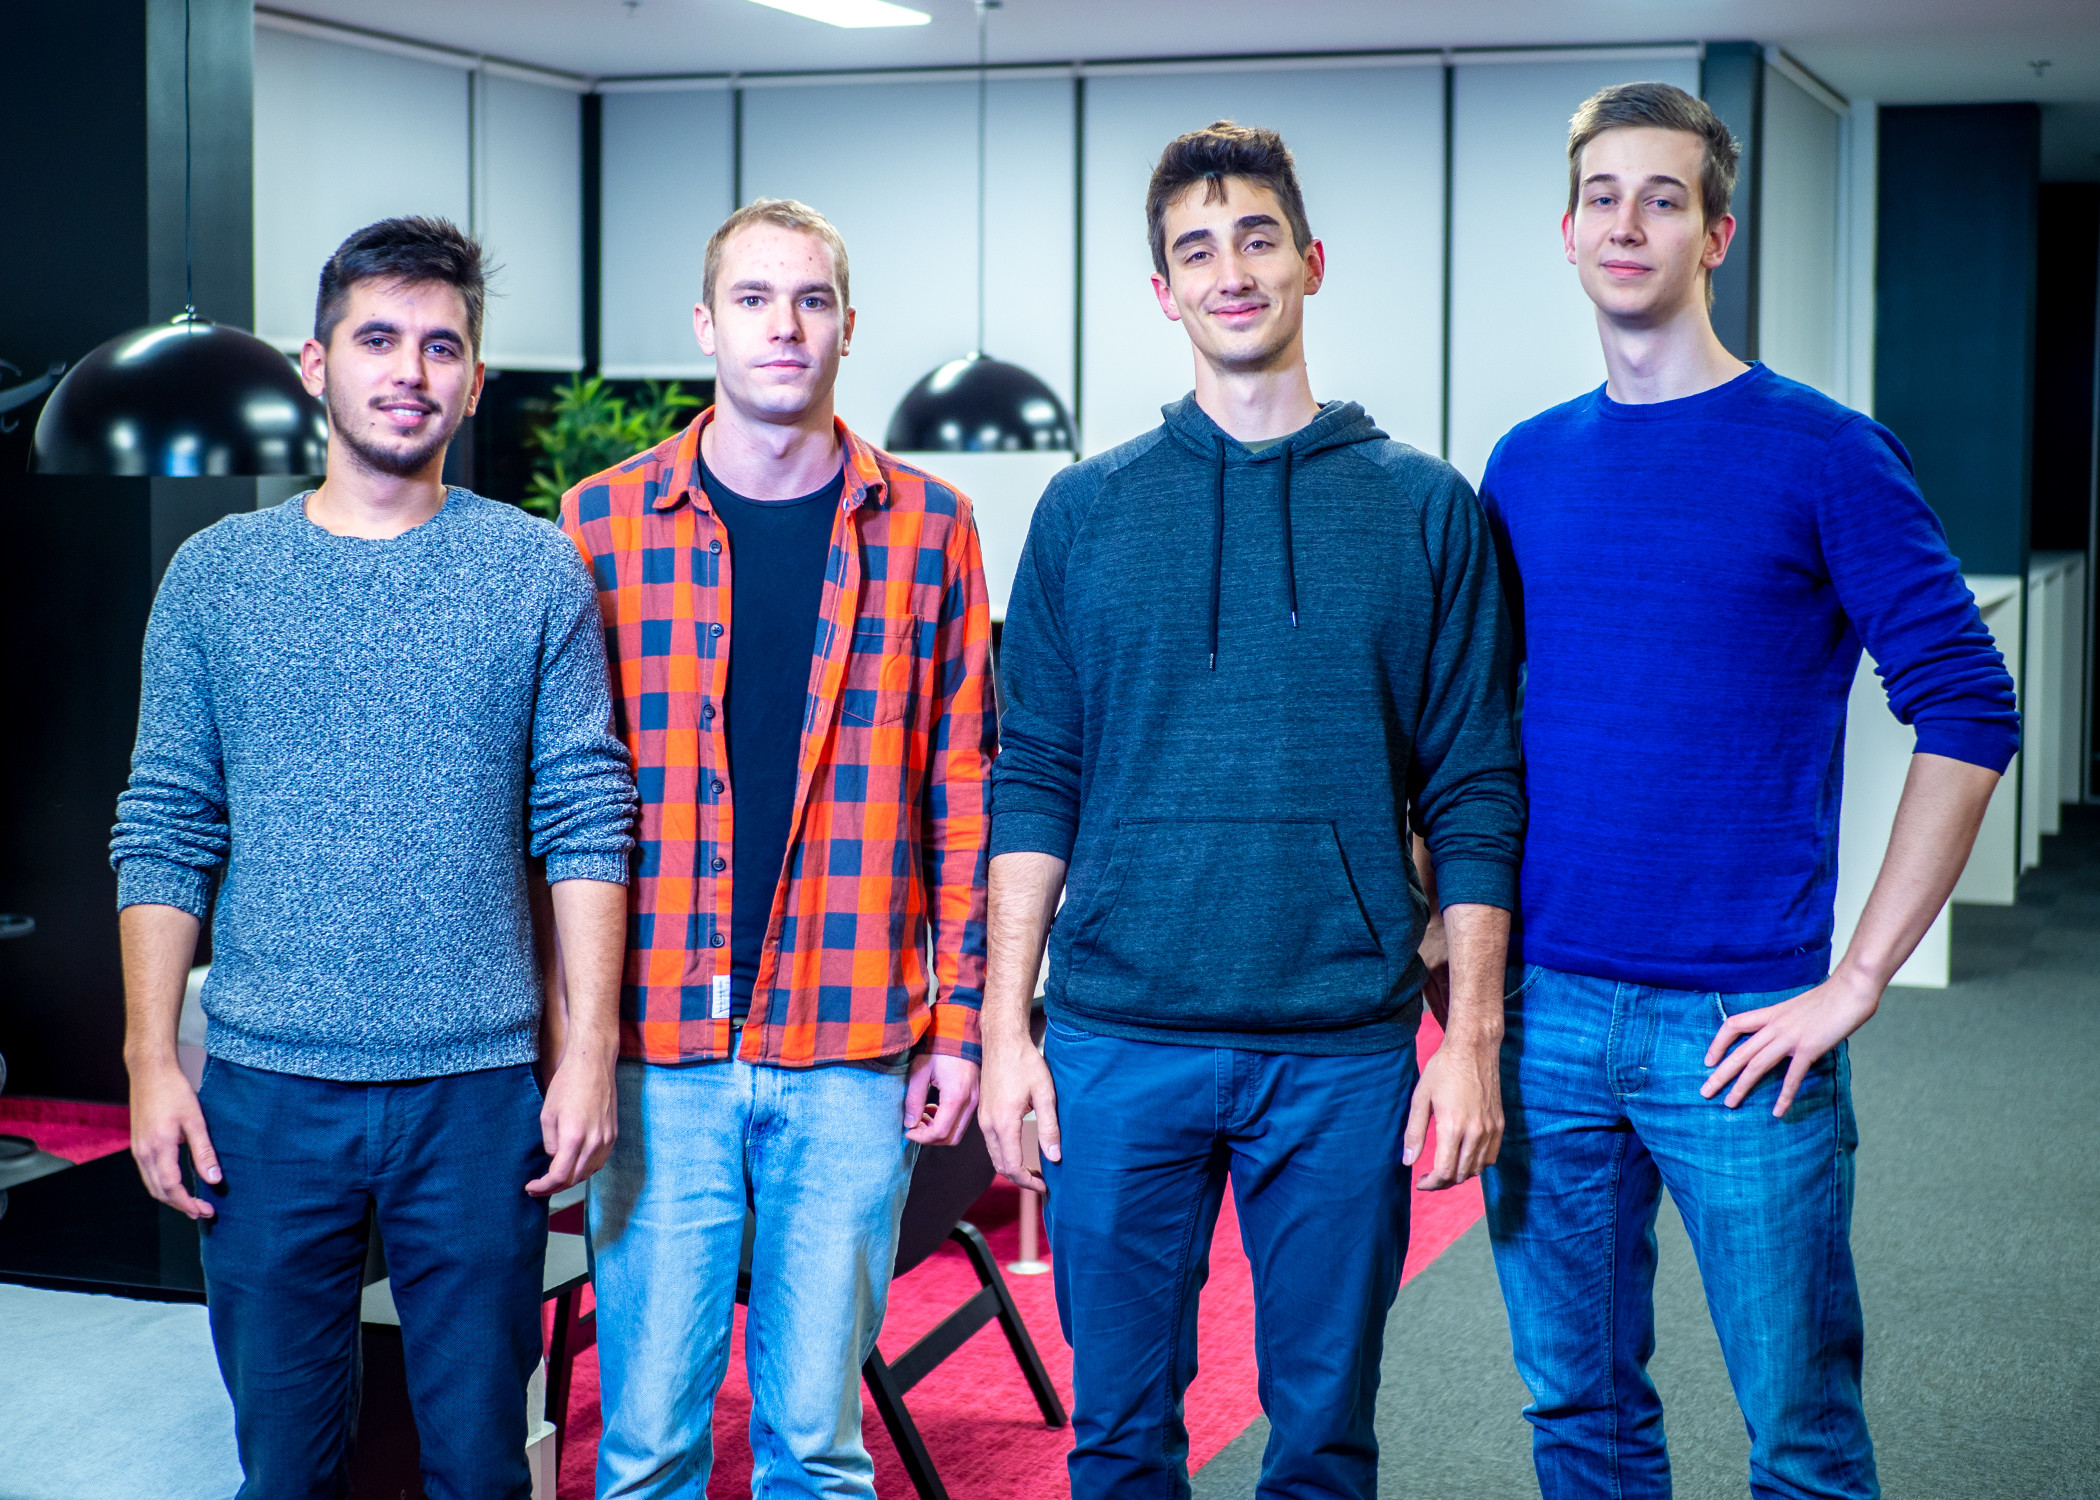 Algebra Lab JayOne Startup teams